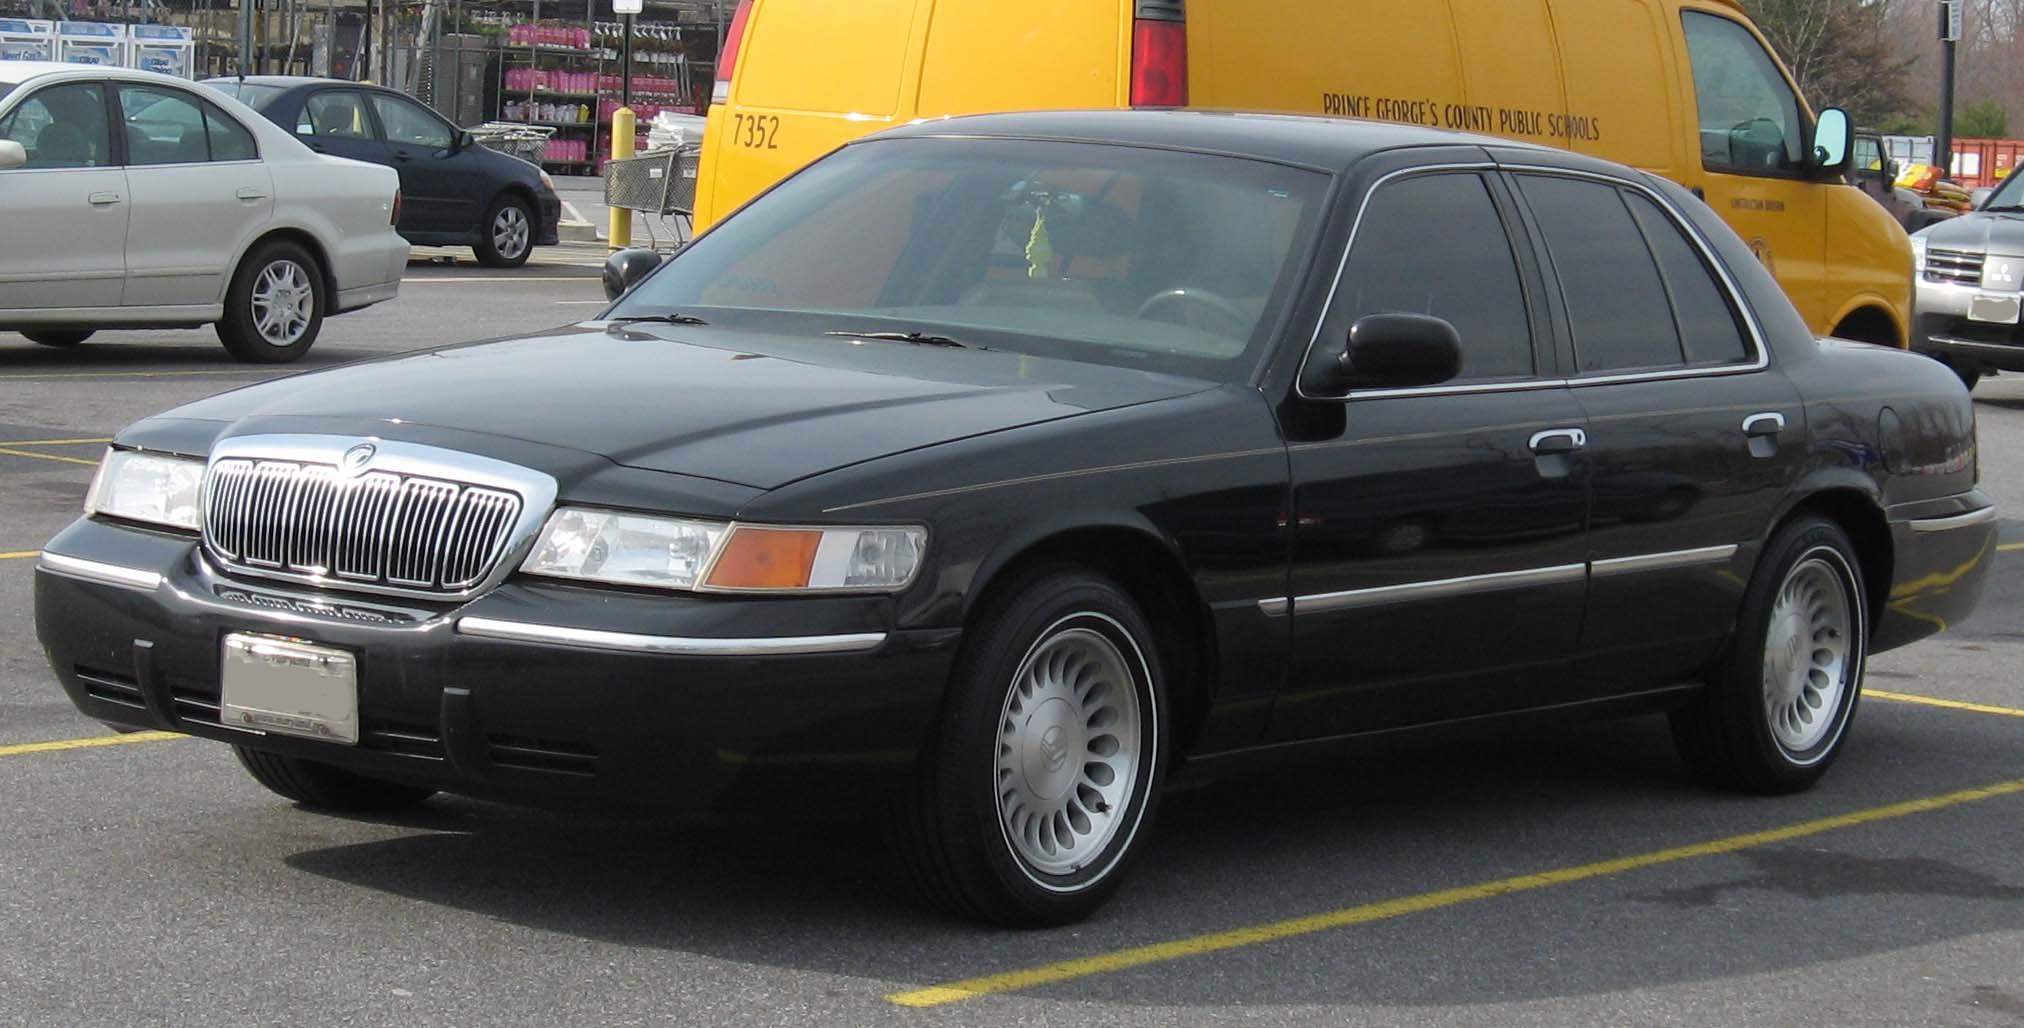 Mercury Grand Marquis Car Photos Mercury Grand Marquis Car Videos Carpictures6 Com